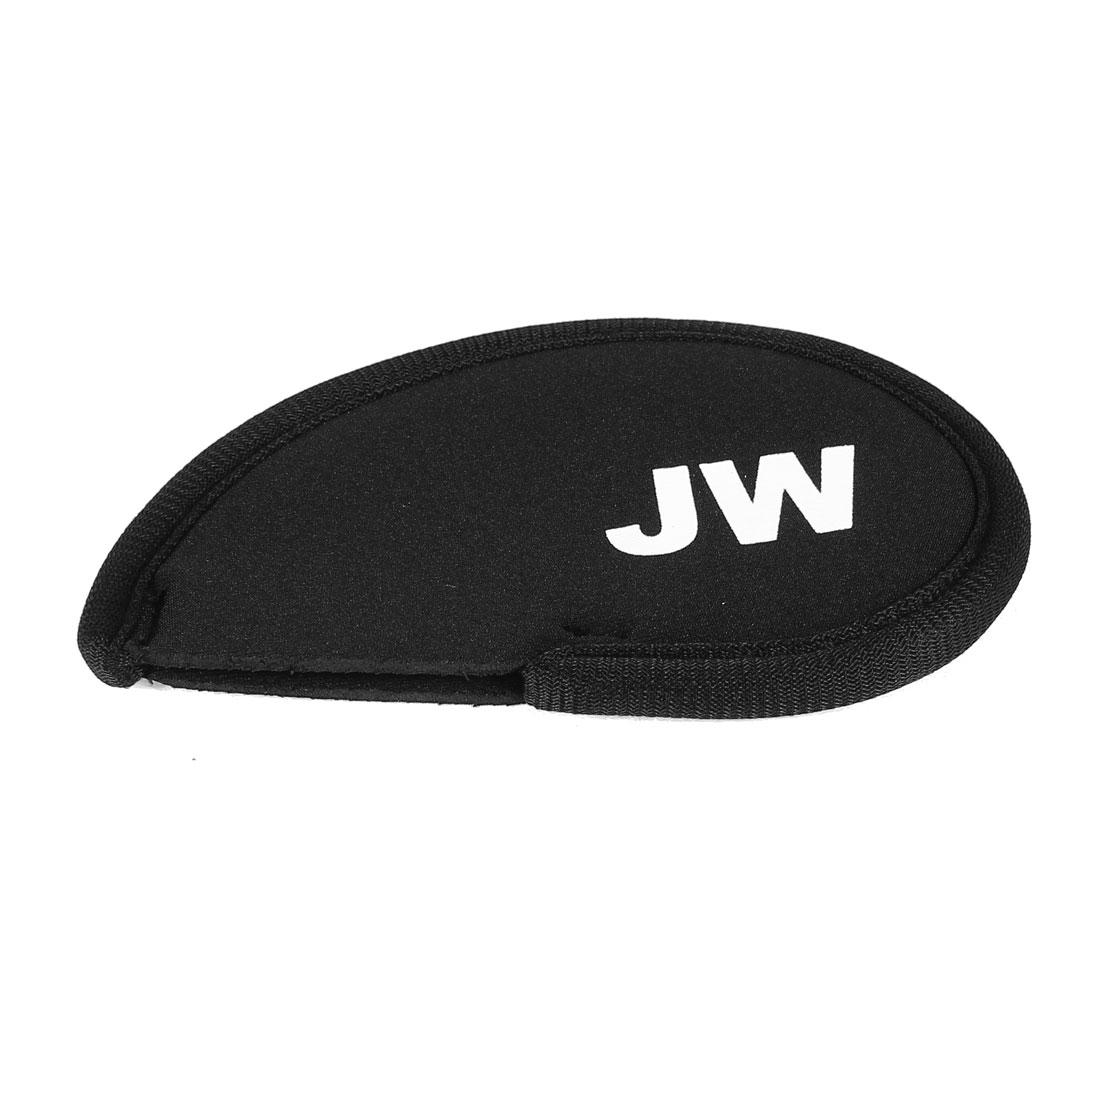 Black Neoprene Golf Club Head Cover JW Wedge Iron Protective Headcovers